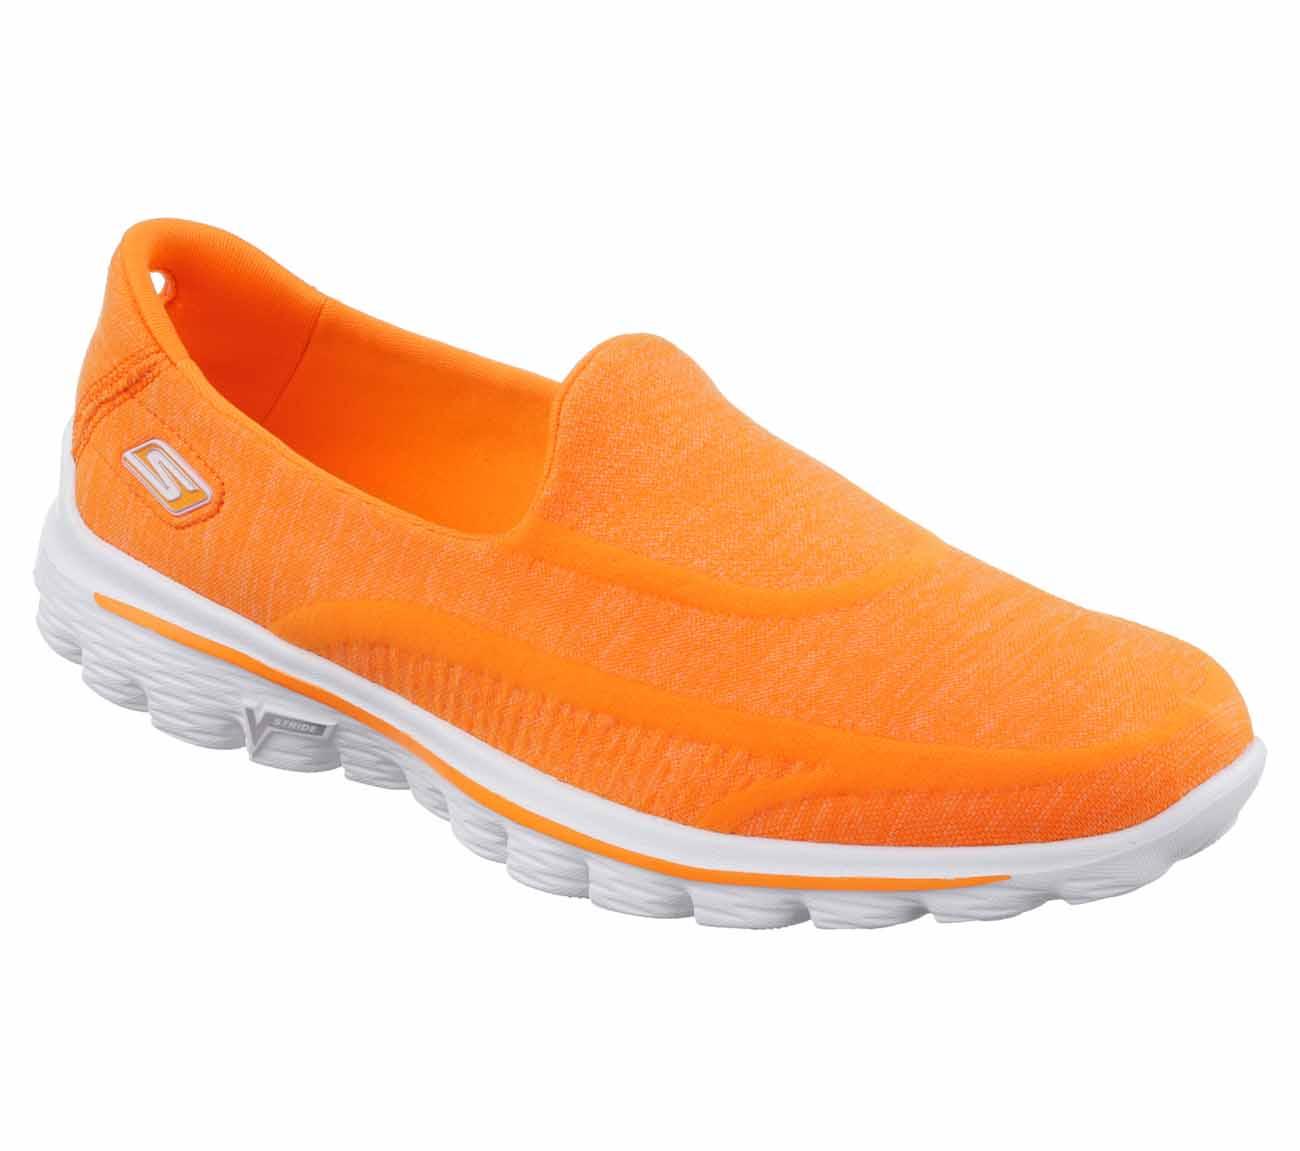 Skechers Go Walk  Super Sock Womens Shoes